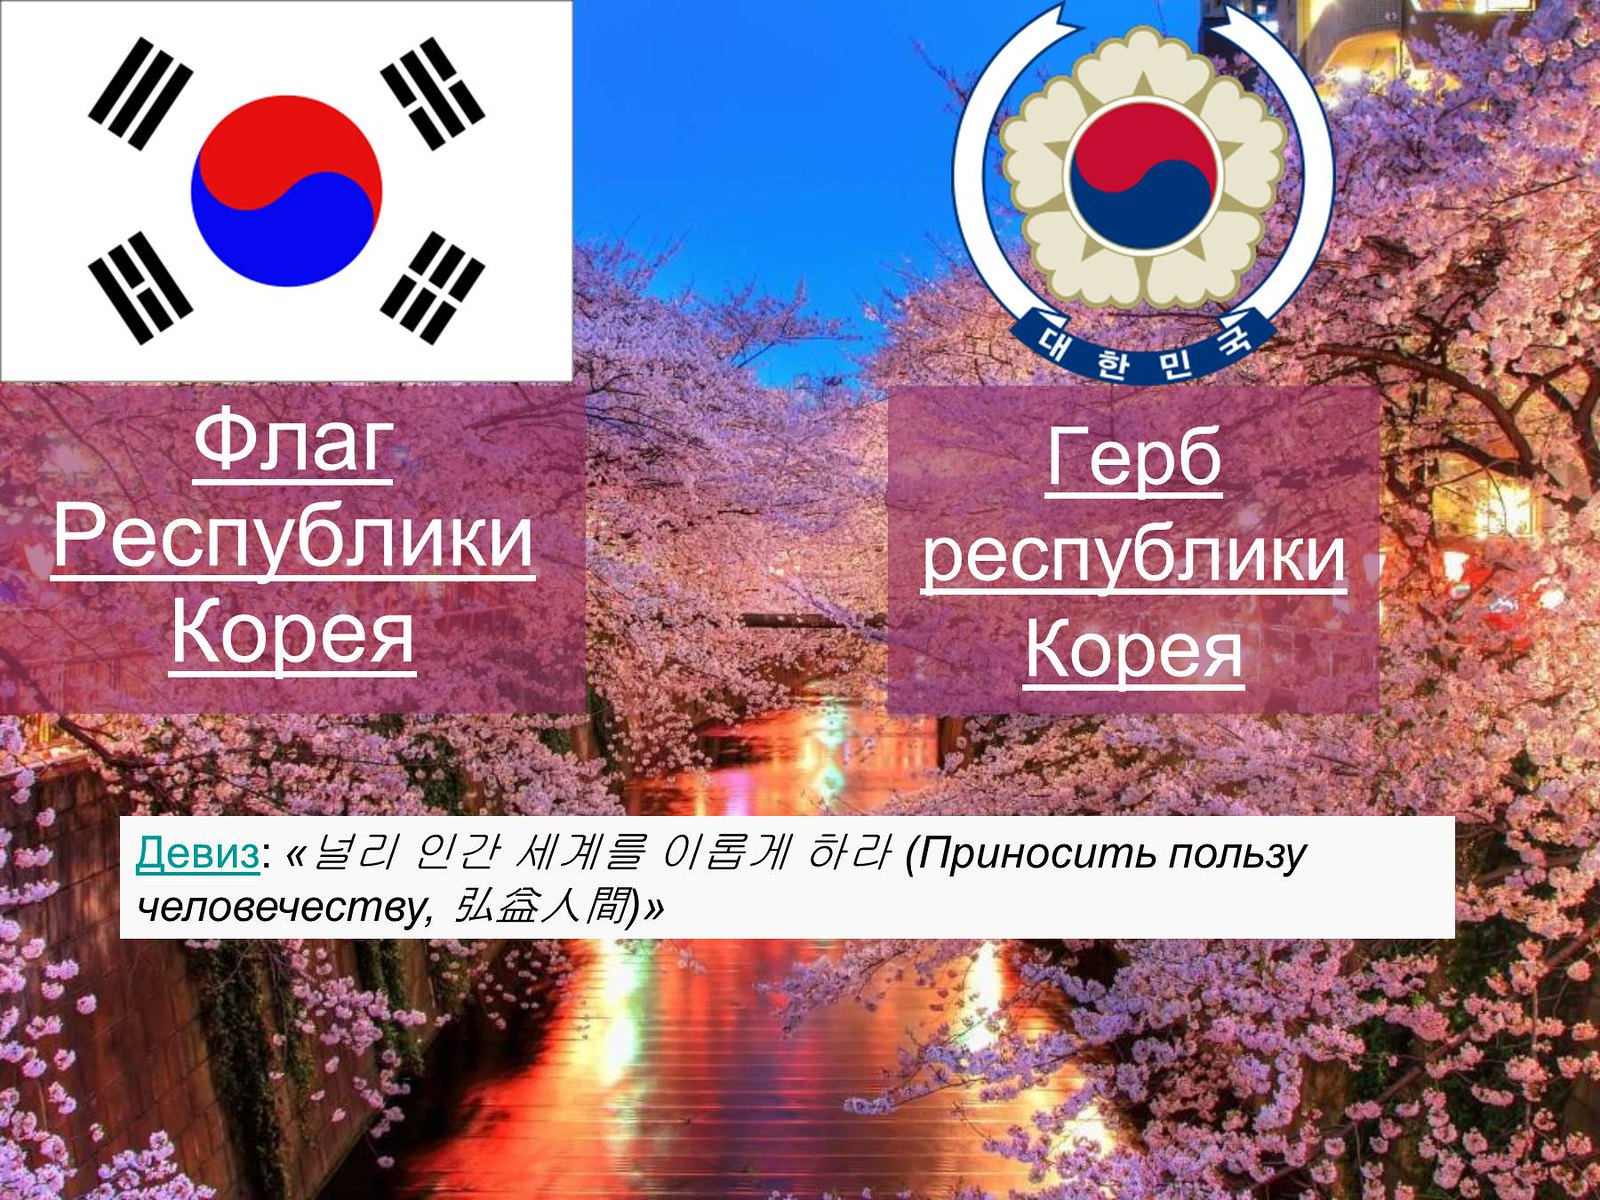 25731453518 c47a7481eb h - Герб Южной Кореи